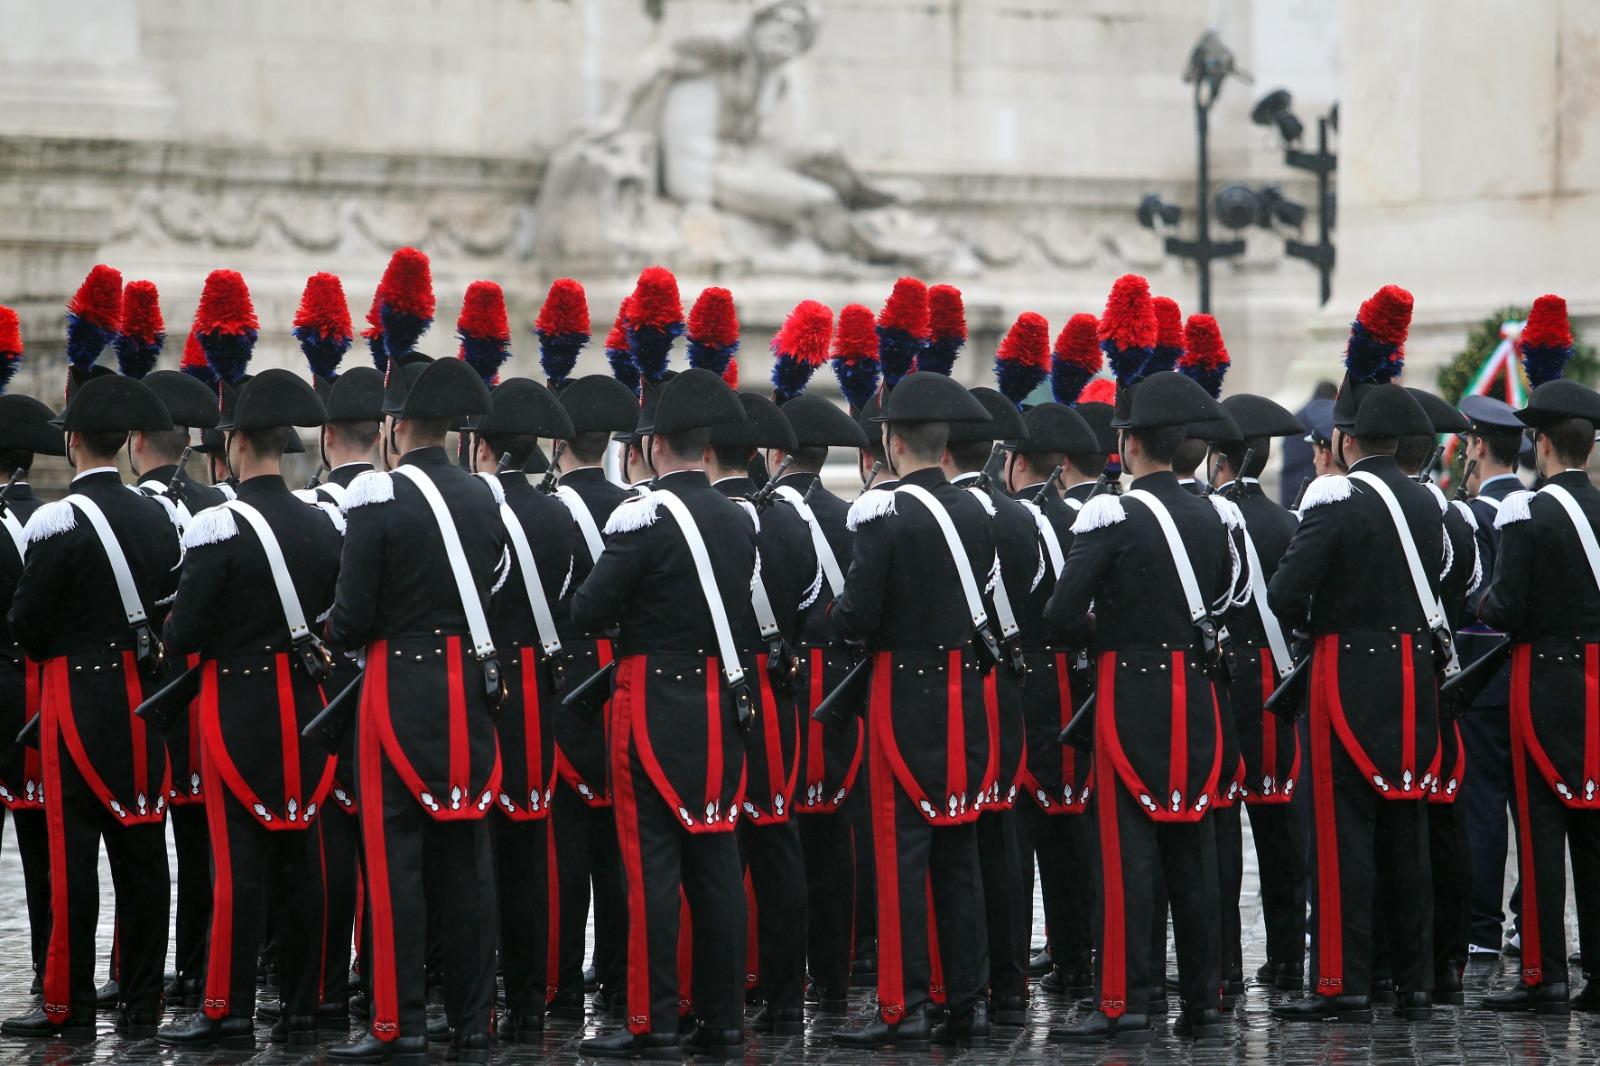 carabinieri lombardia